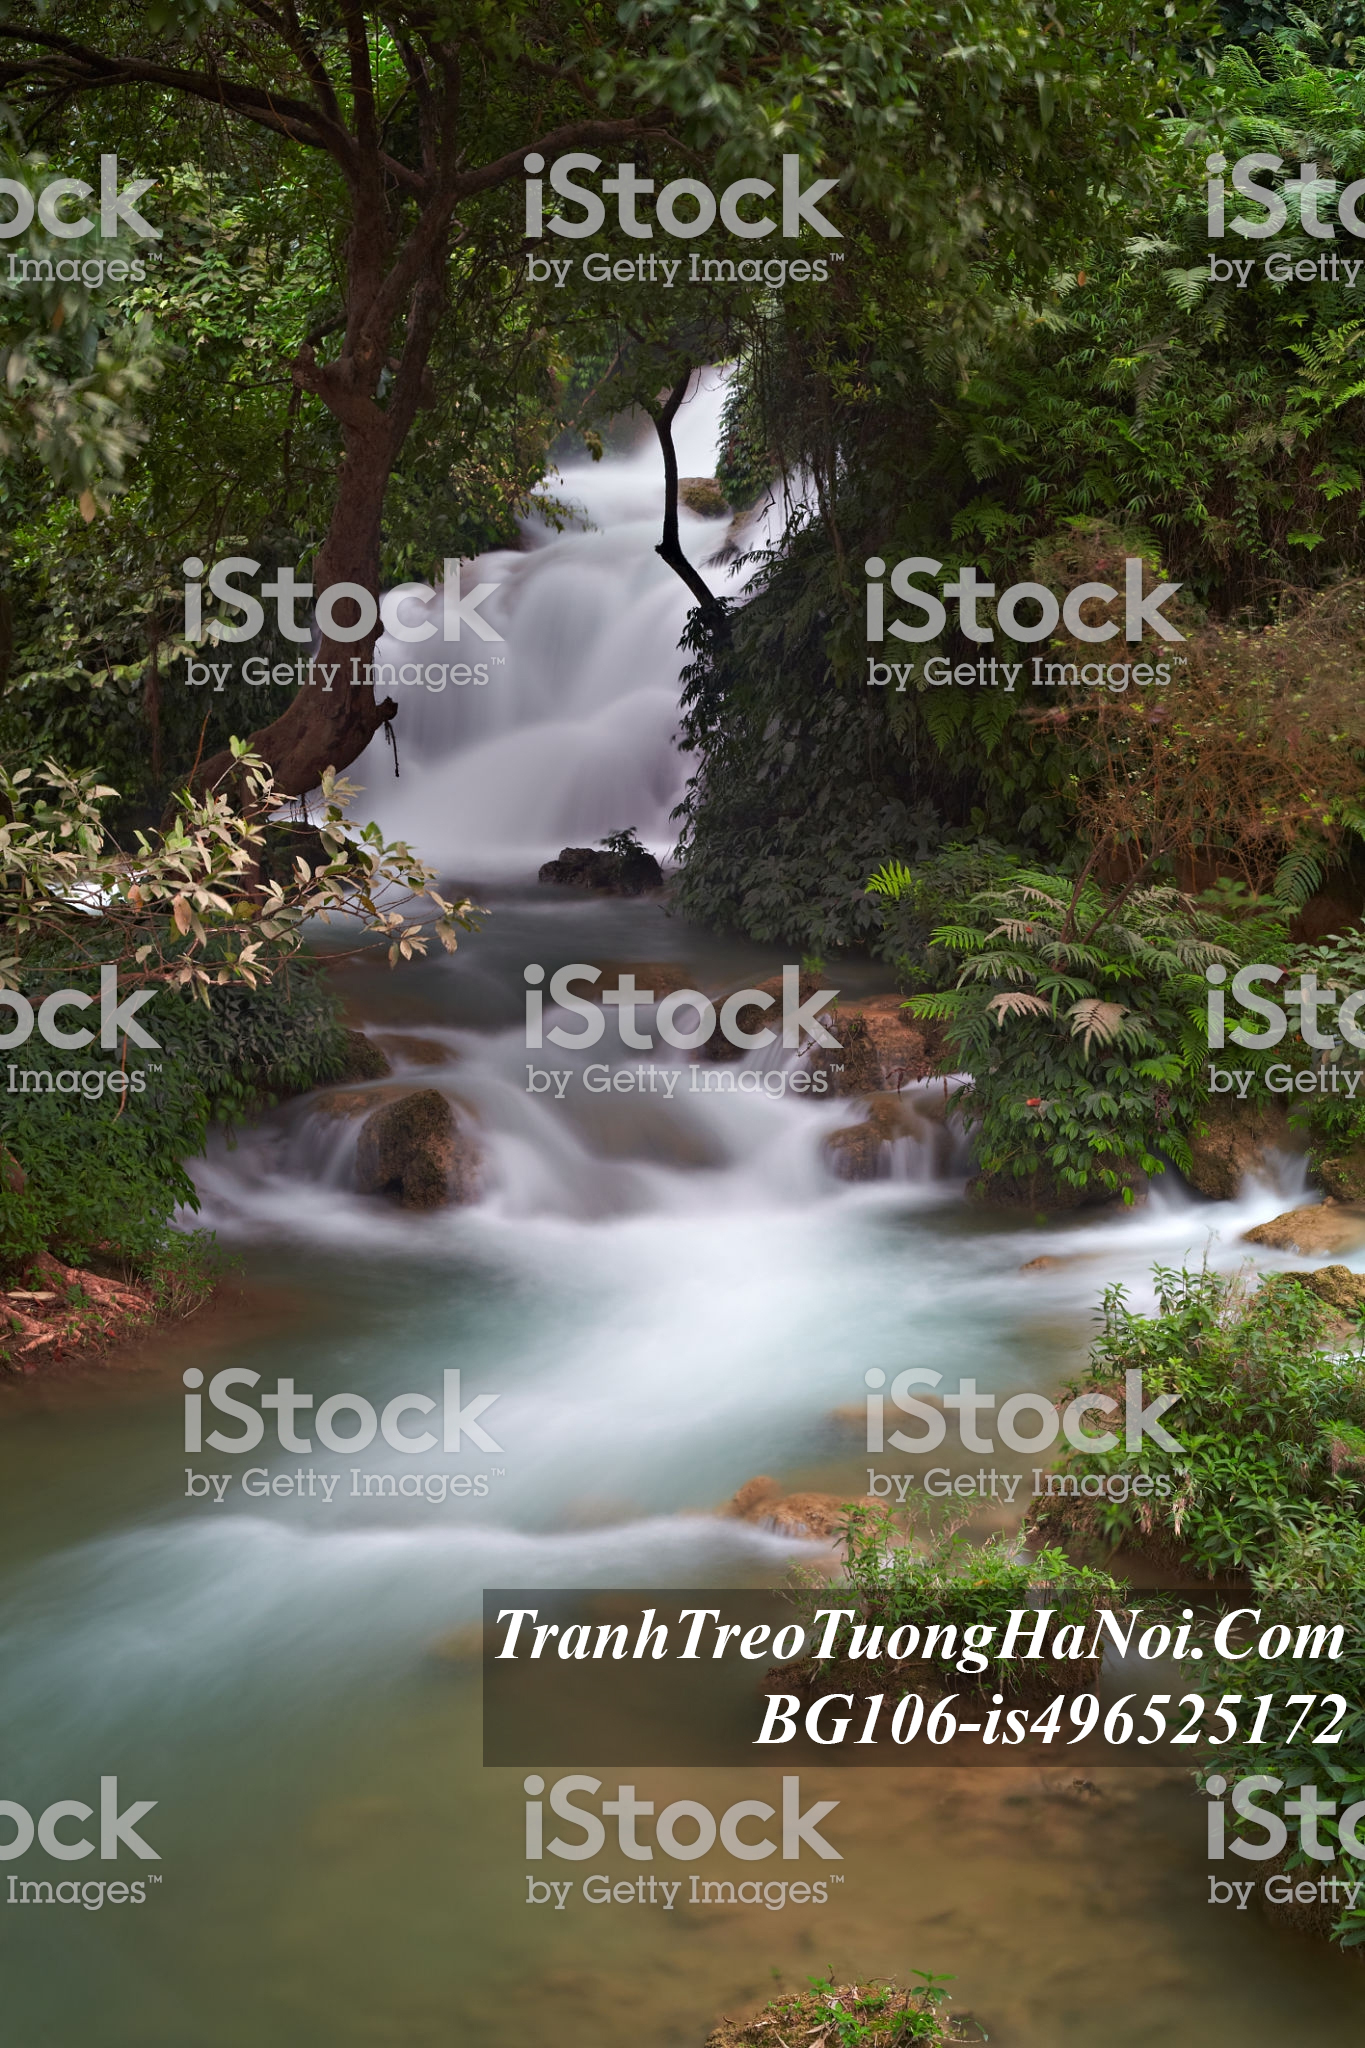 Tranh thac nuoc ban gioc kieu dung amia BG106-is496525172